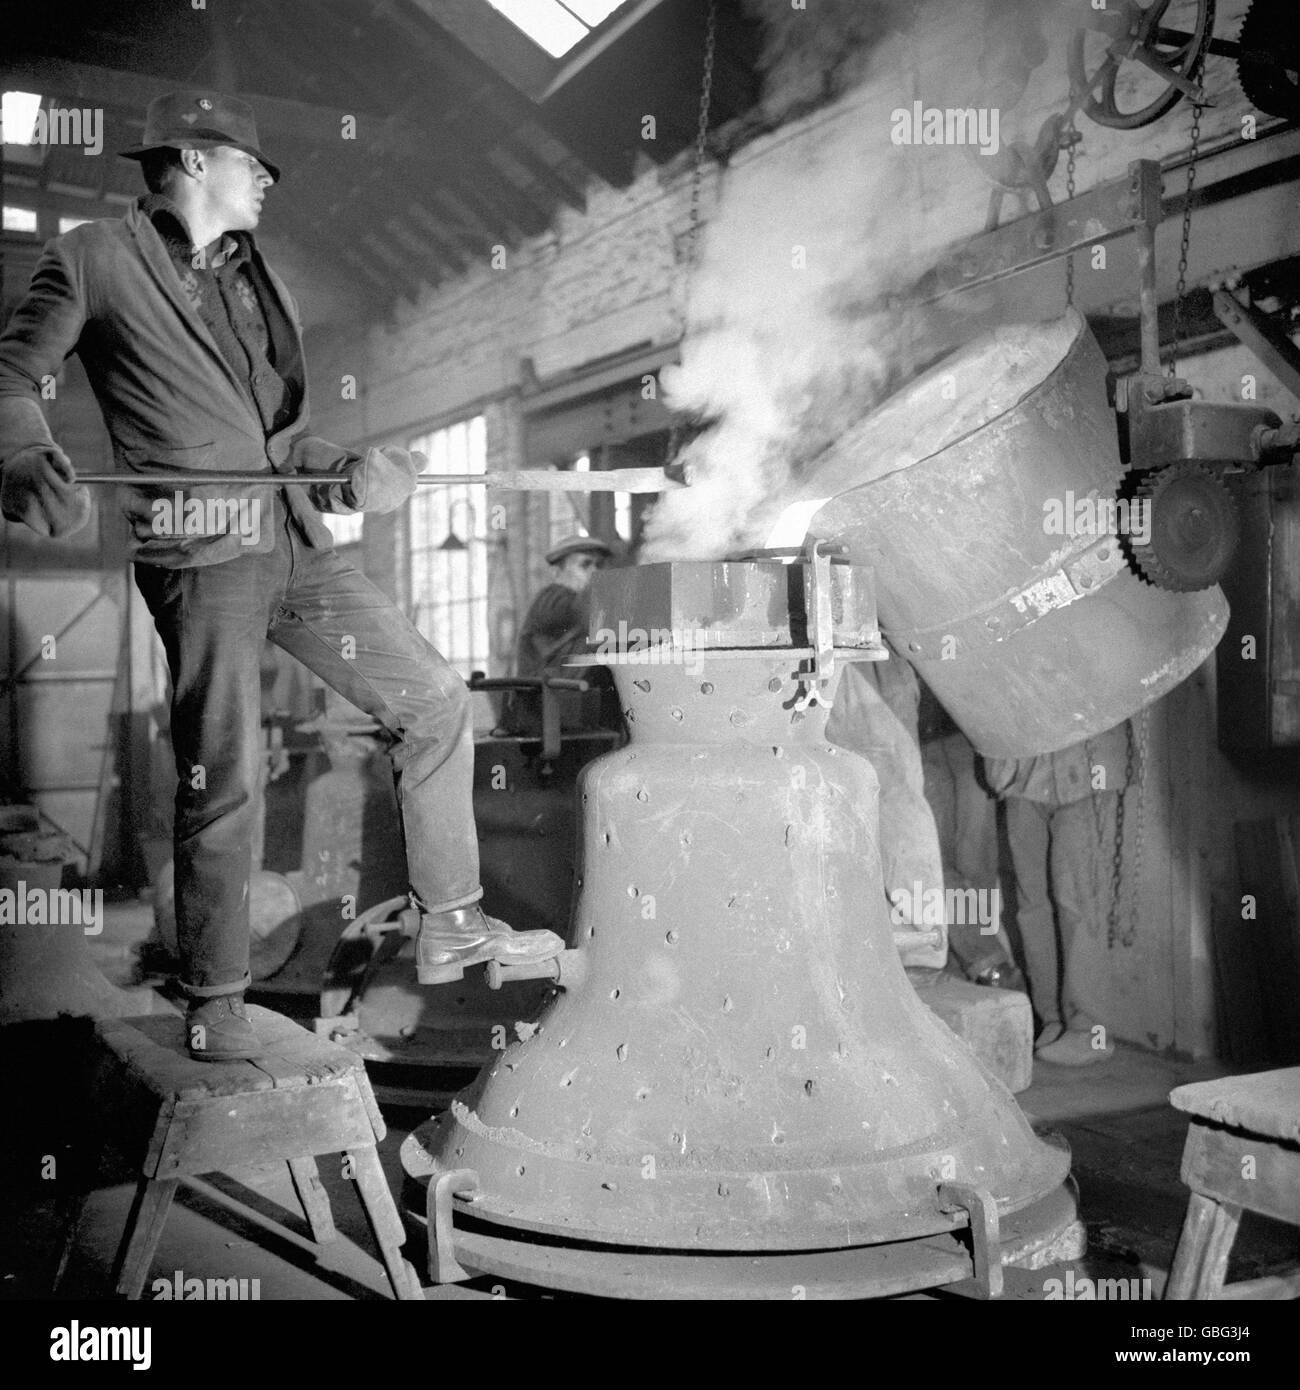 British Industry - Whitechapel Bell Foundry - London - 1965 - Stock Image